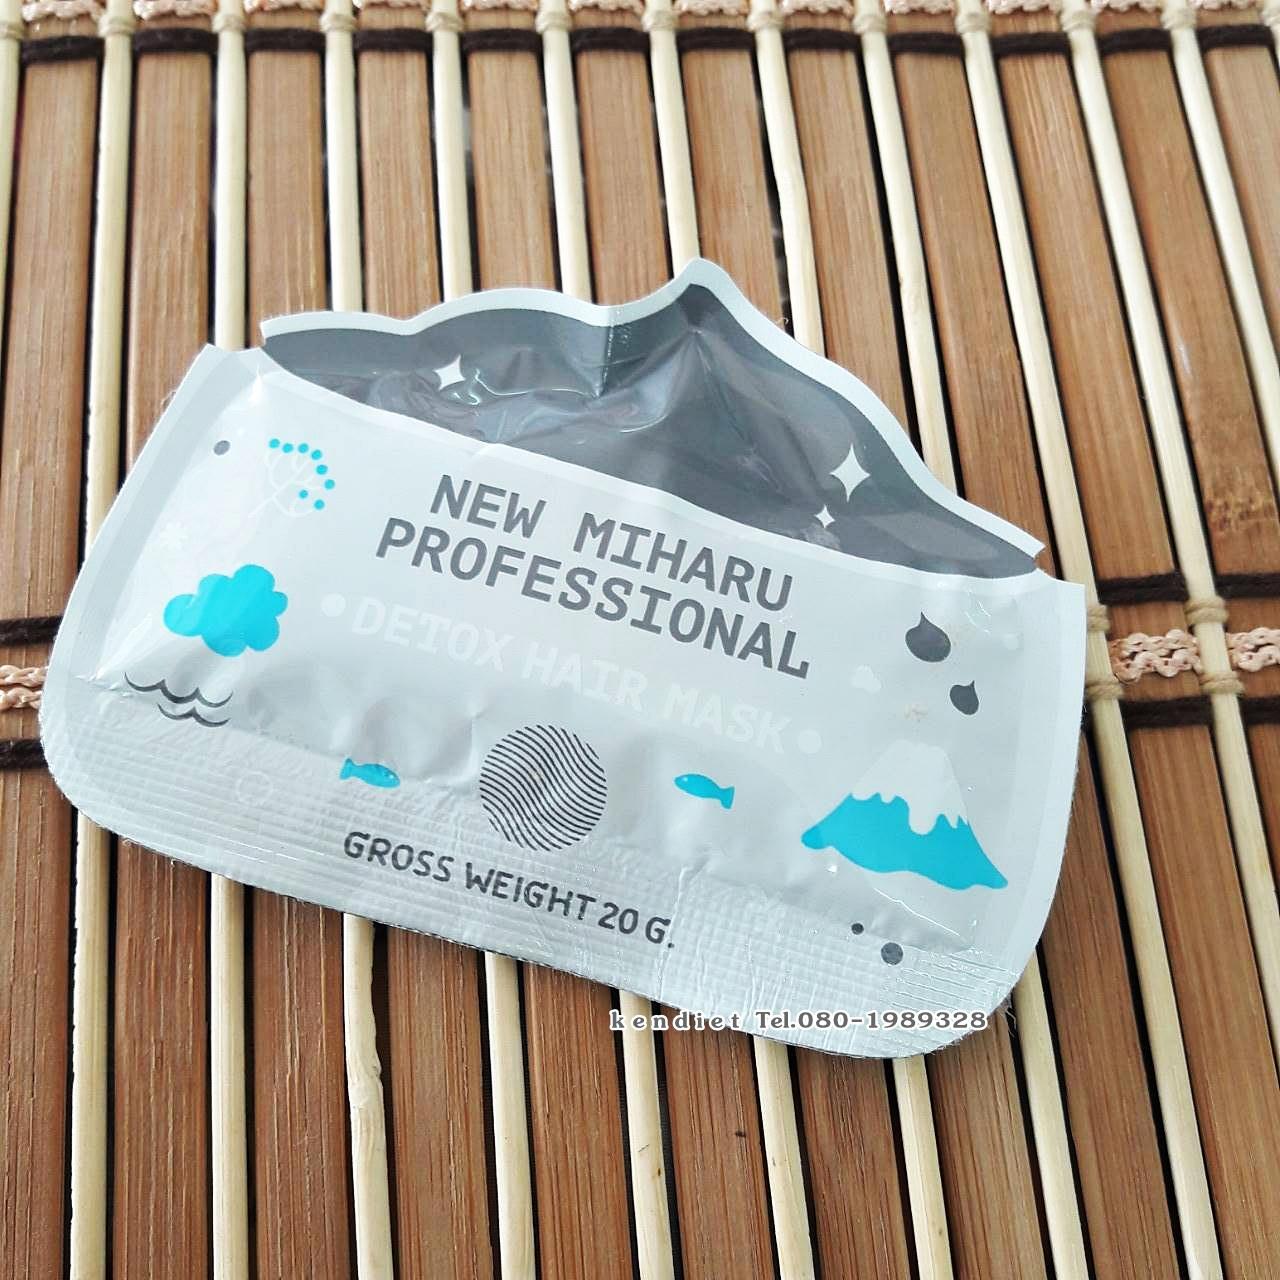 New Miharu Professional Detox Hair Mask โคลนหมักผมมิฮารุ แพ็คเกจใหม่ แบบซอง